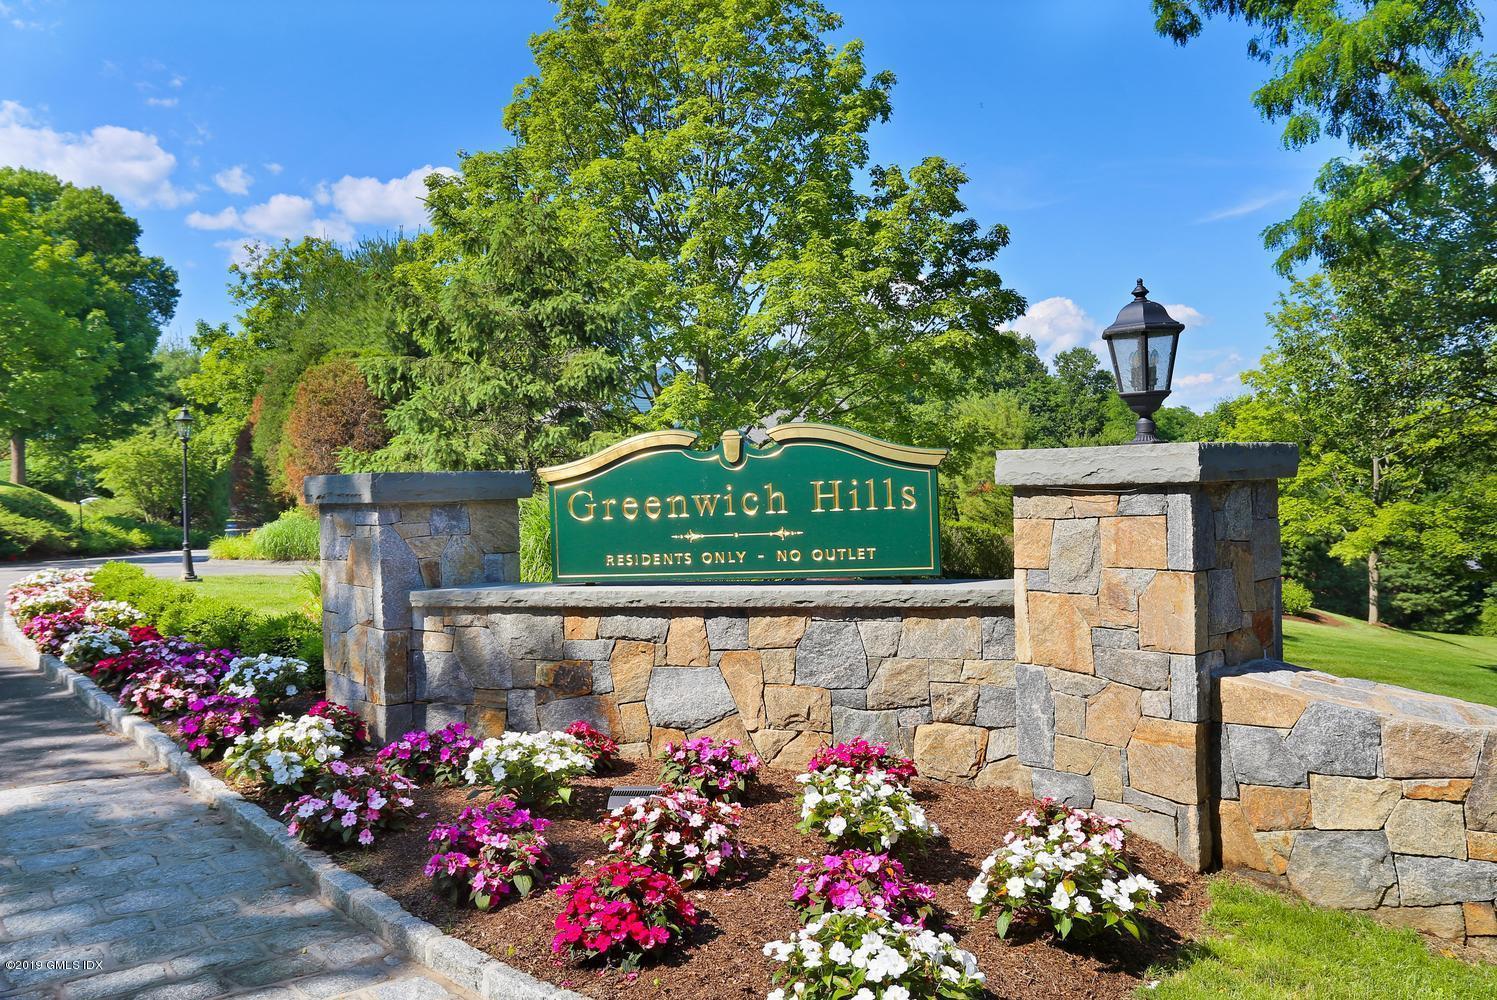 102 Greenwich Hills Drive,Greenwich,Connecticut 06831,2 Bedrooms Bedrooms,2 BathroomsBathrooms,Condominium,Greenwich Hills,105217